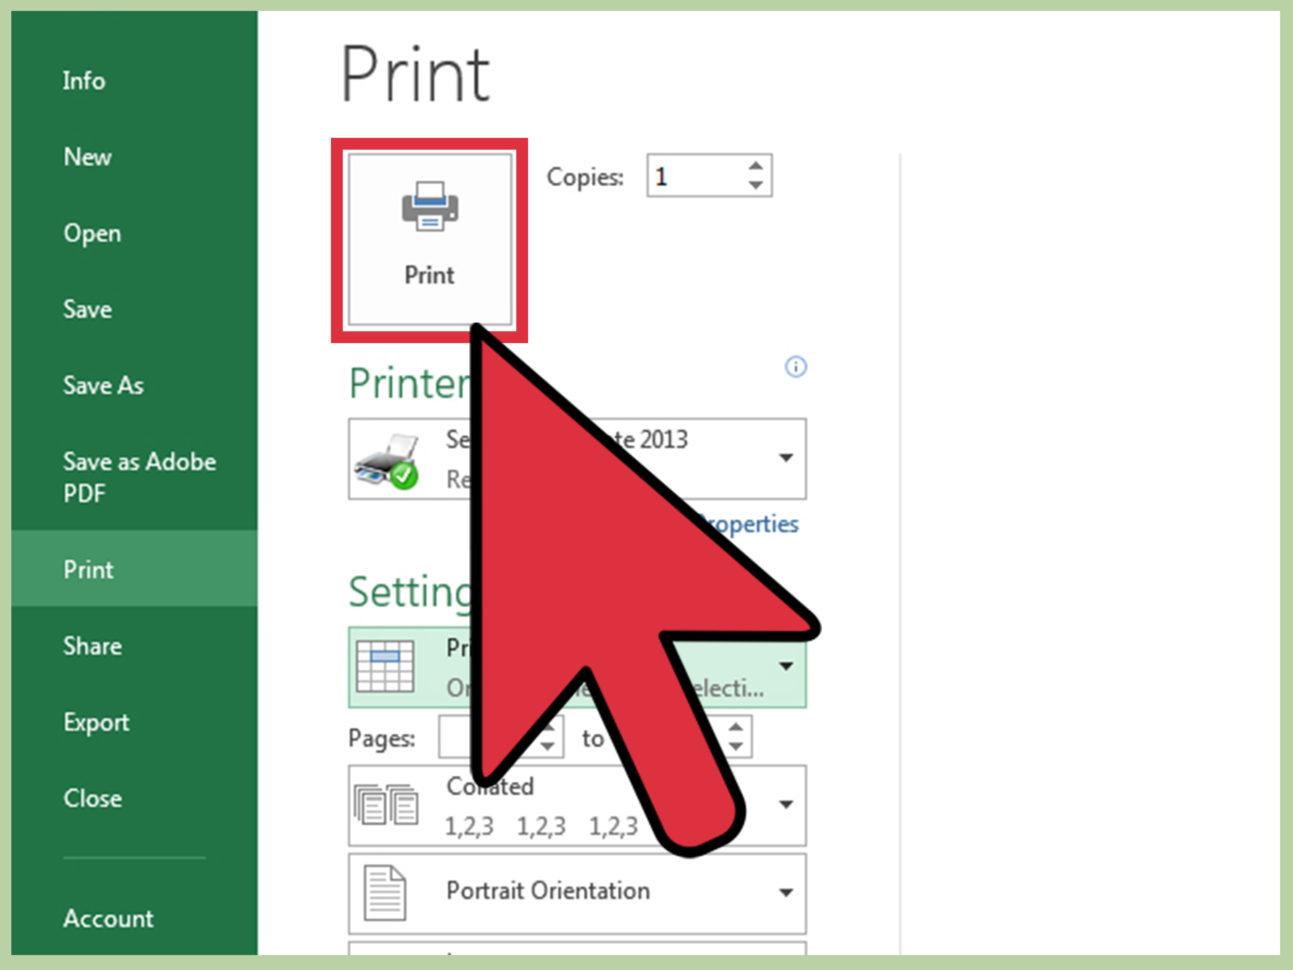 Spreadsheet Deutsch With Regard To 3 Ways To Print Part Of An Excel Spreadsheet  Wikihow